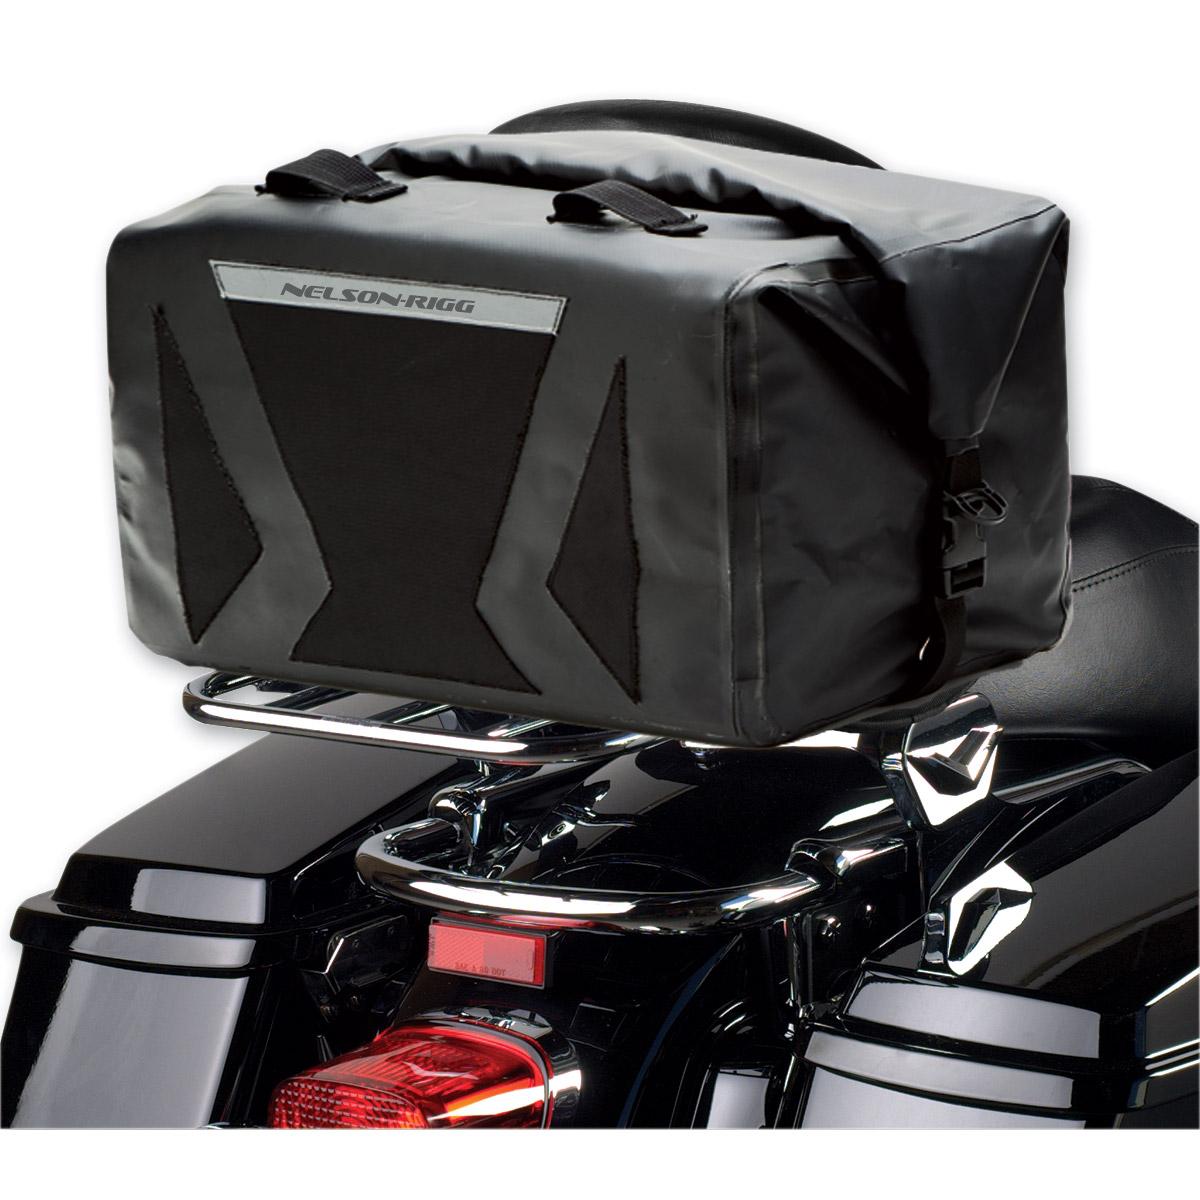 Nelson-Rigg SVT-250 Survivor Dry Roll Bag